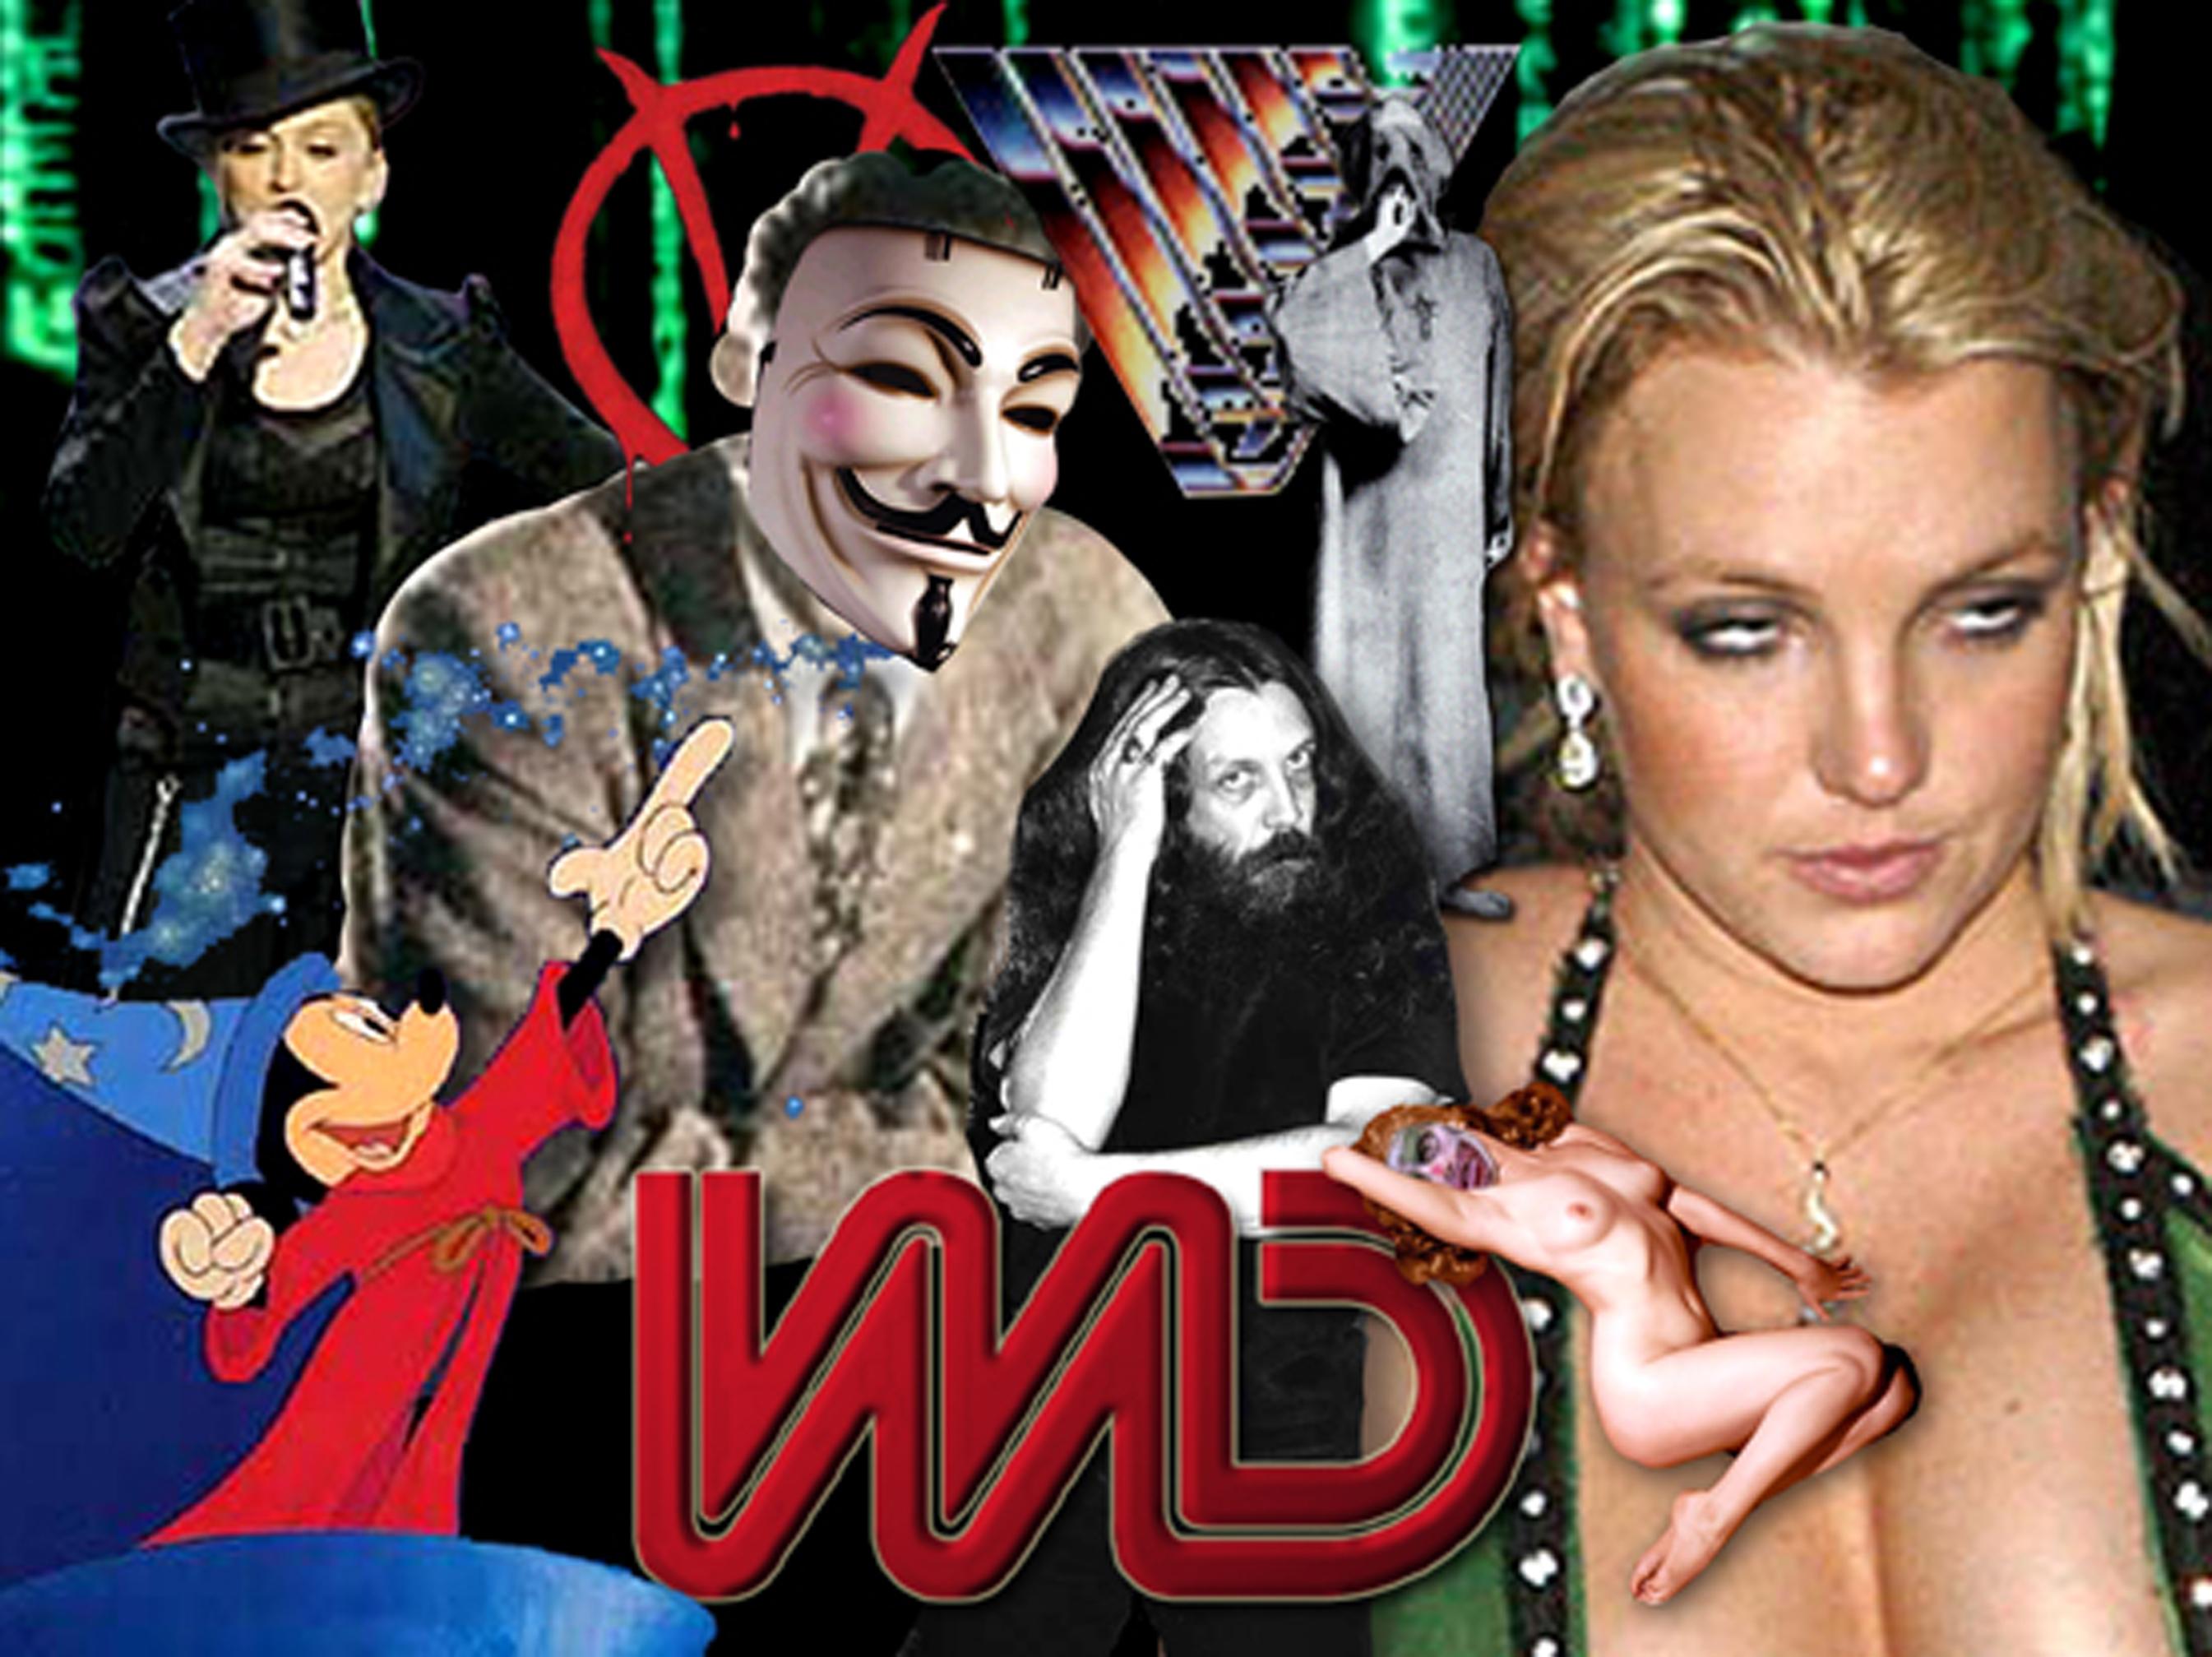 Mark of the beast freemantv mark beast celebrity mind control buycottarizona